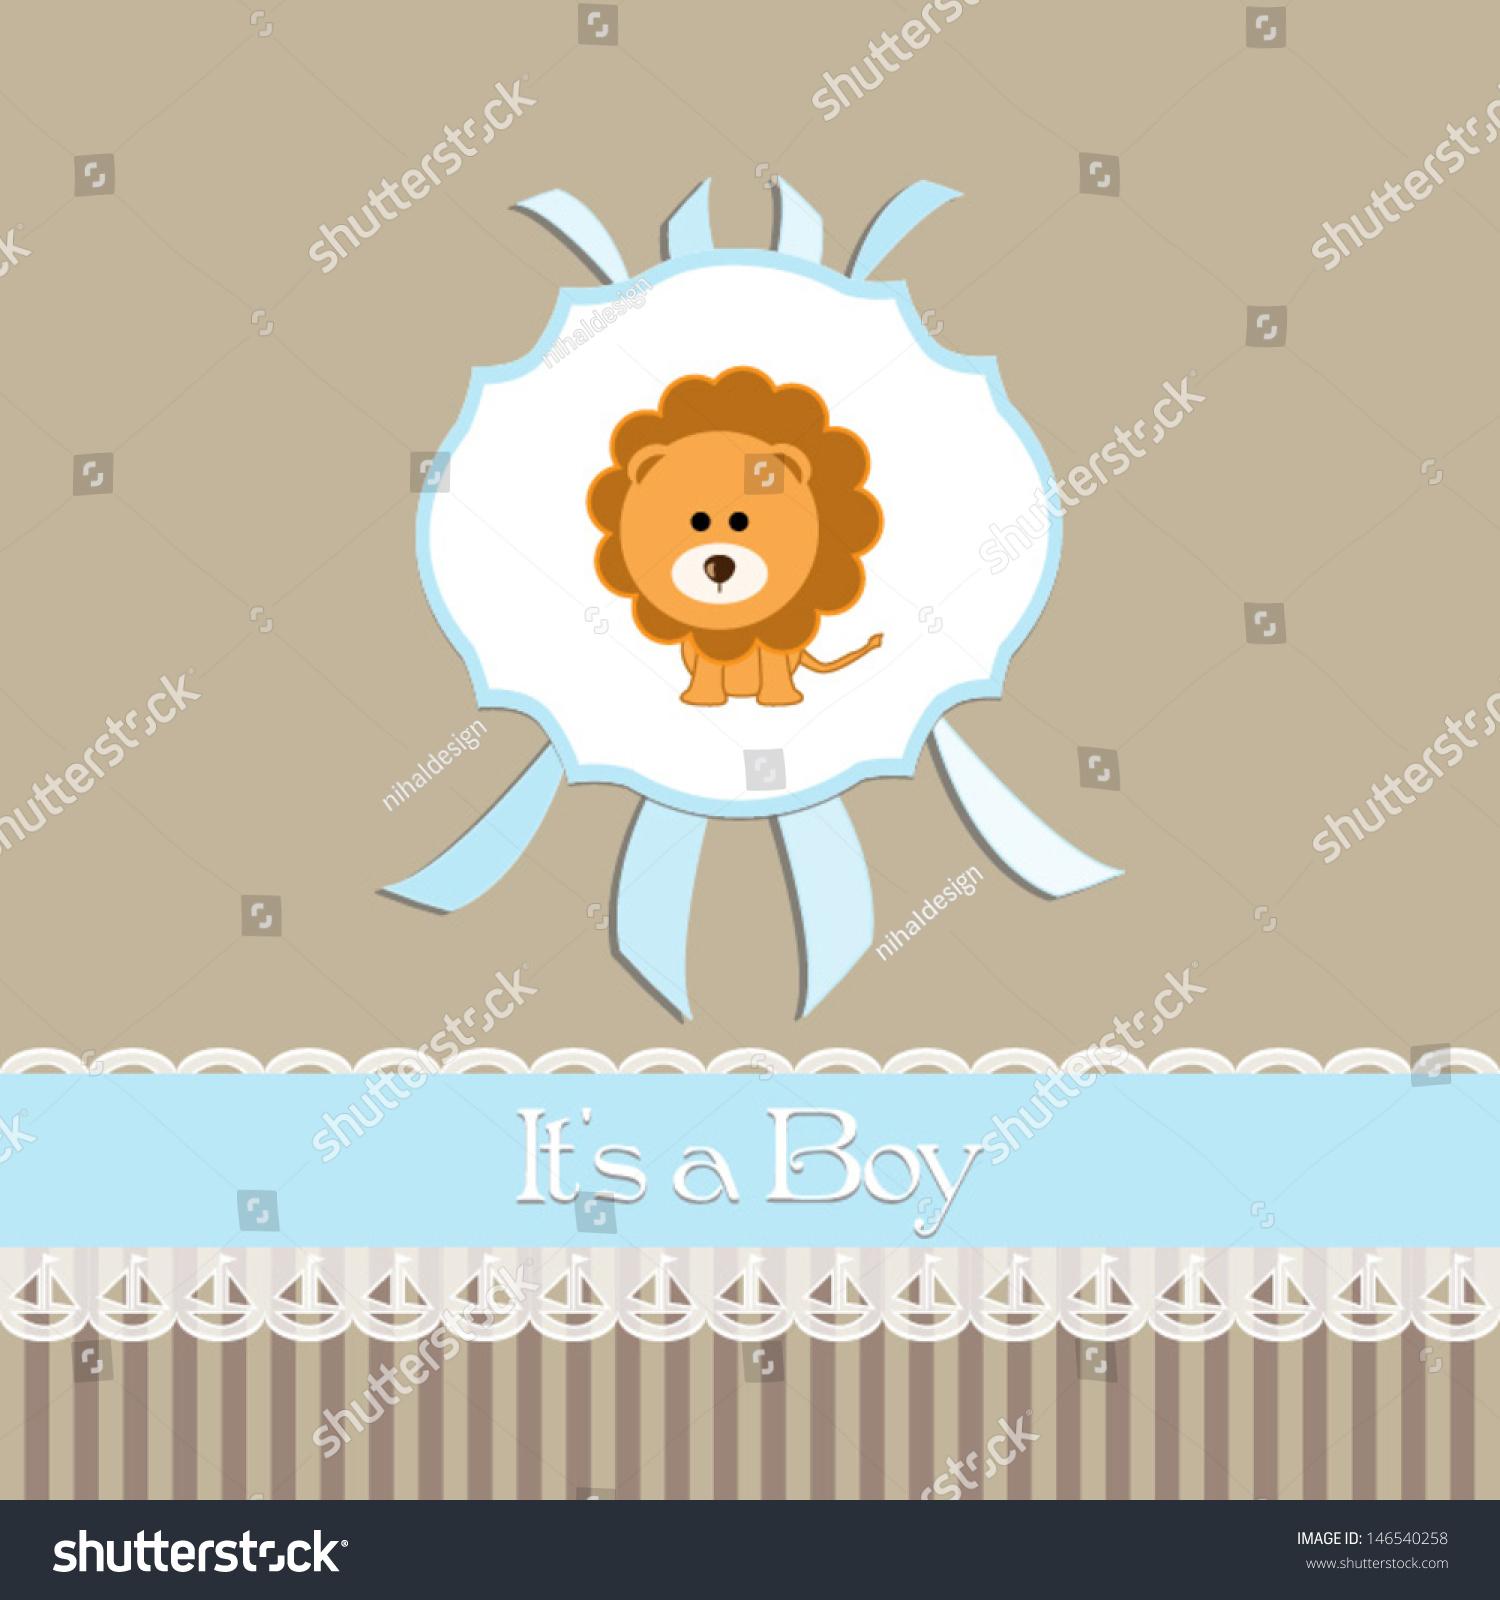 Baby Shower Invitation Baby Boybeige Background Stock Vector ...